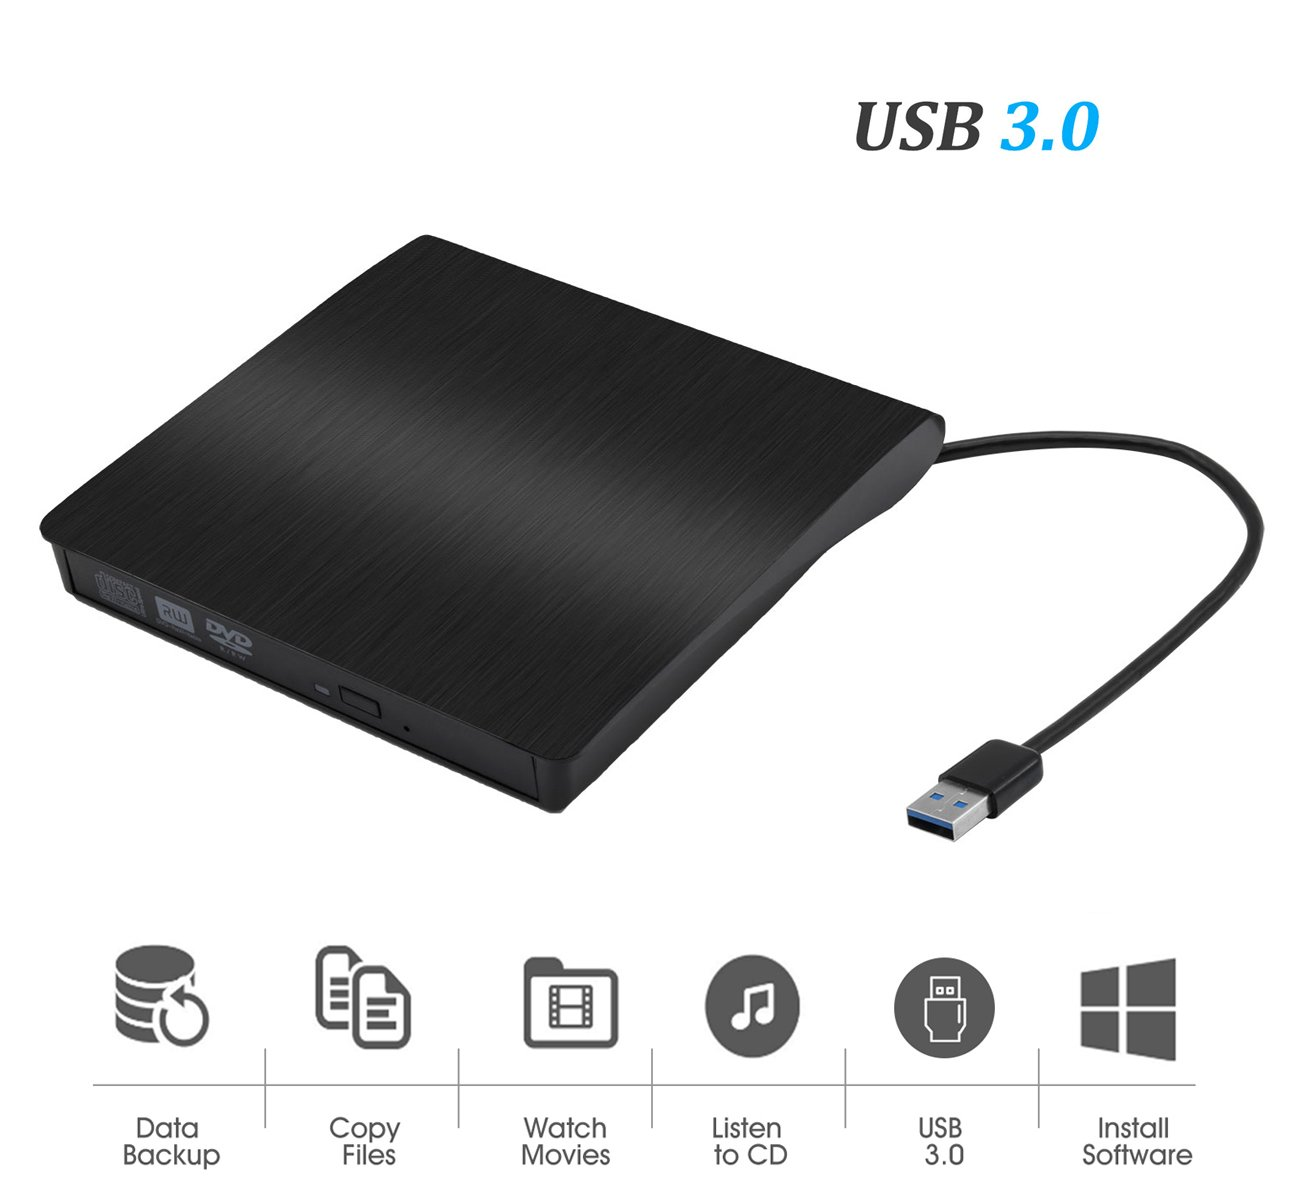 External CD Drive USB 3.0 Slim External DVD CD Drive, Gipow High Speed Data Transfer DVD/CD +/-RM Writer Burner Rewriter DVD CD ROM Drive for Macbook Pro/Laptops/Desktops/Notebook(Black)